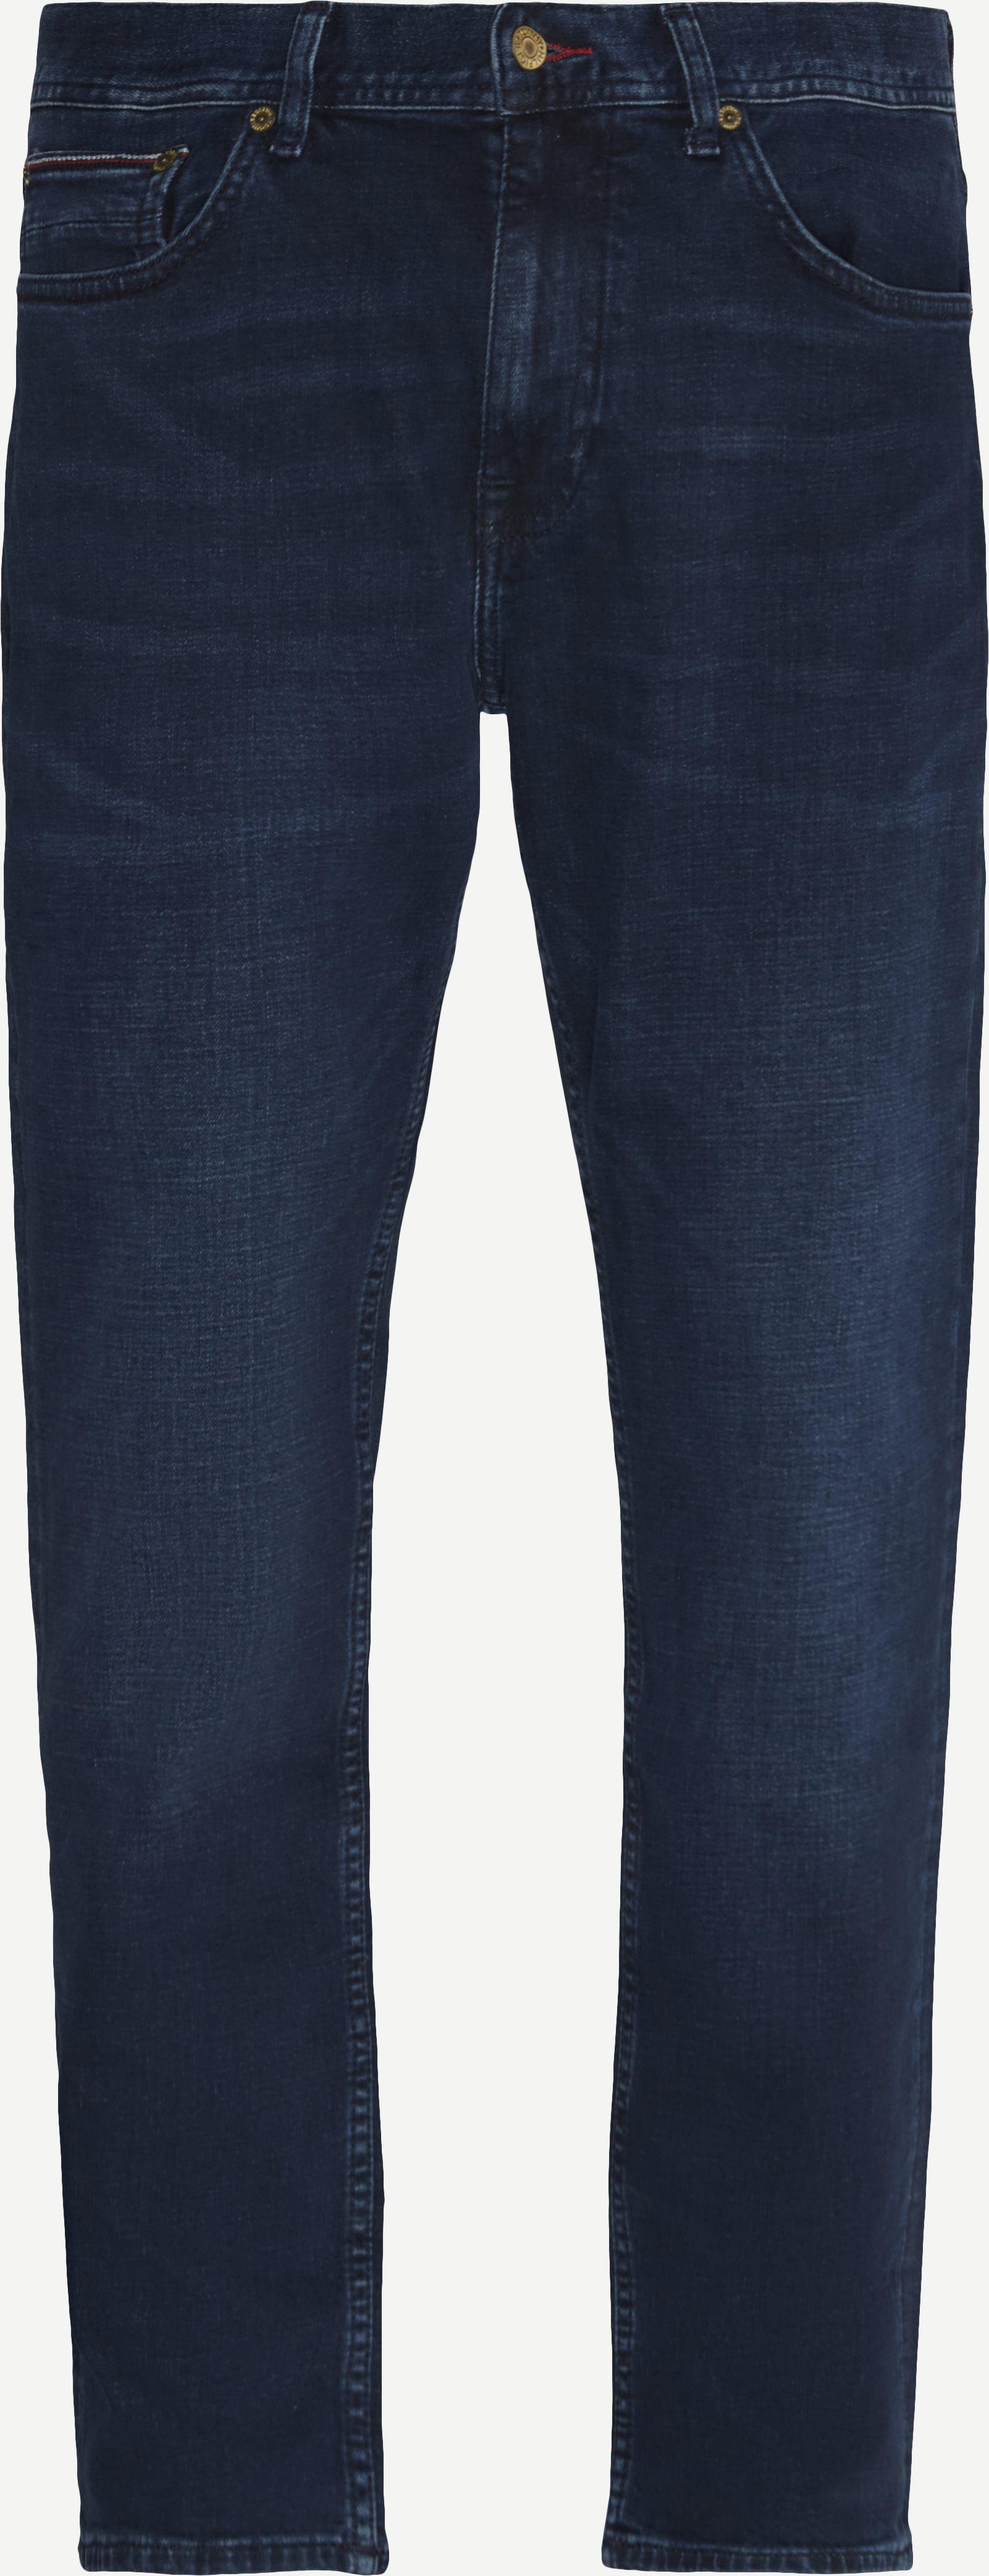 Jeans - Jeans-Blau